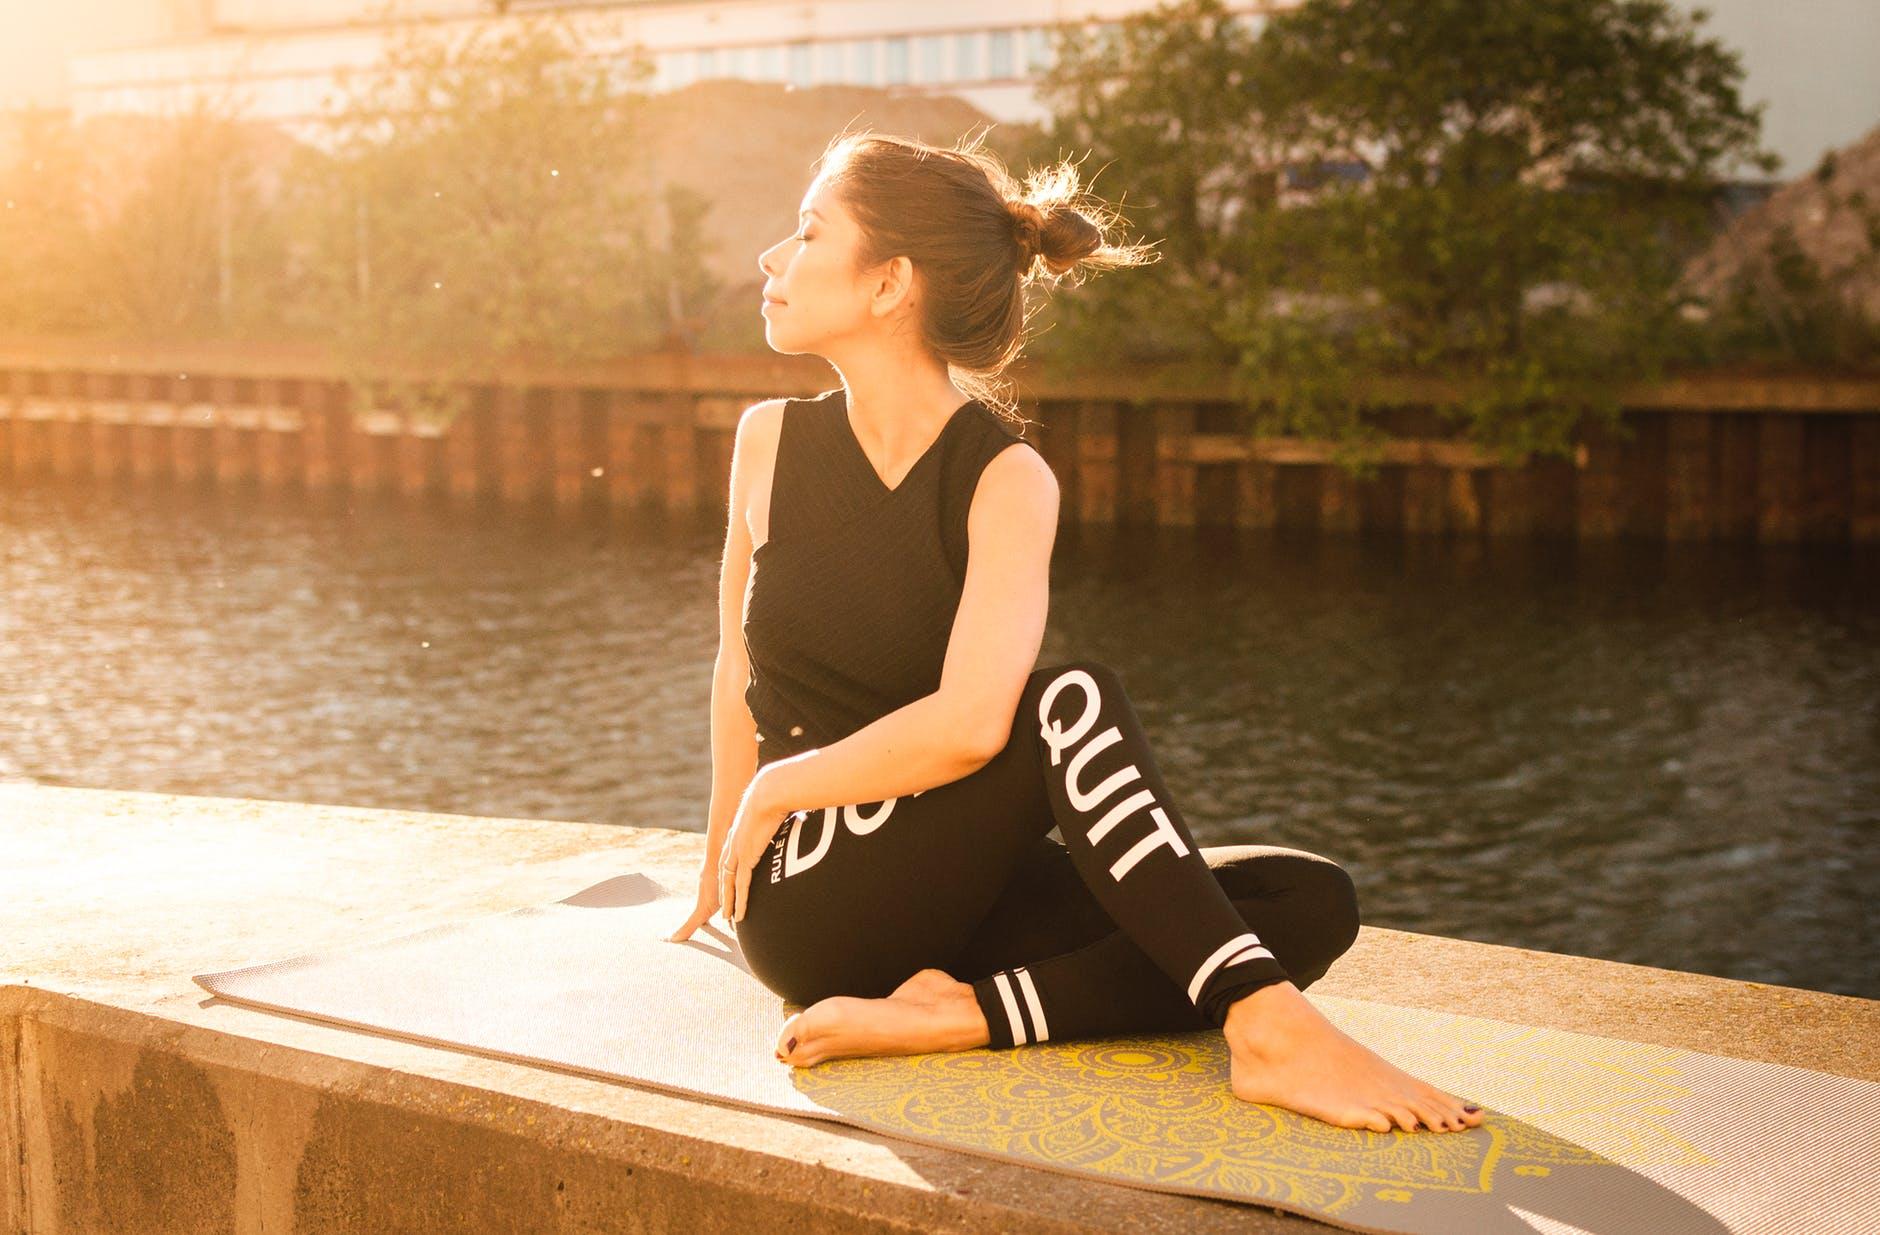 Yoga, Aerobics or Gym?